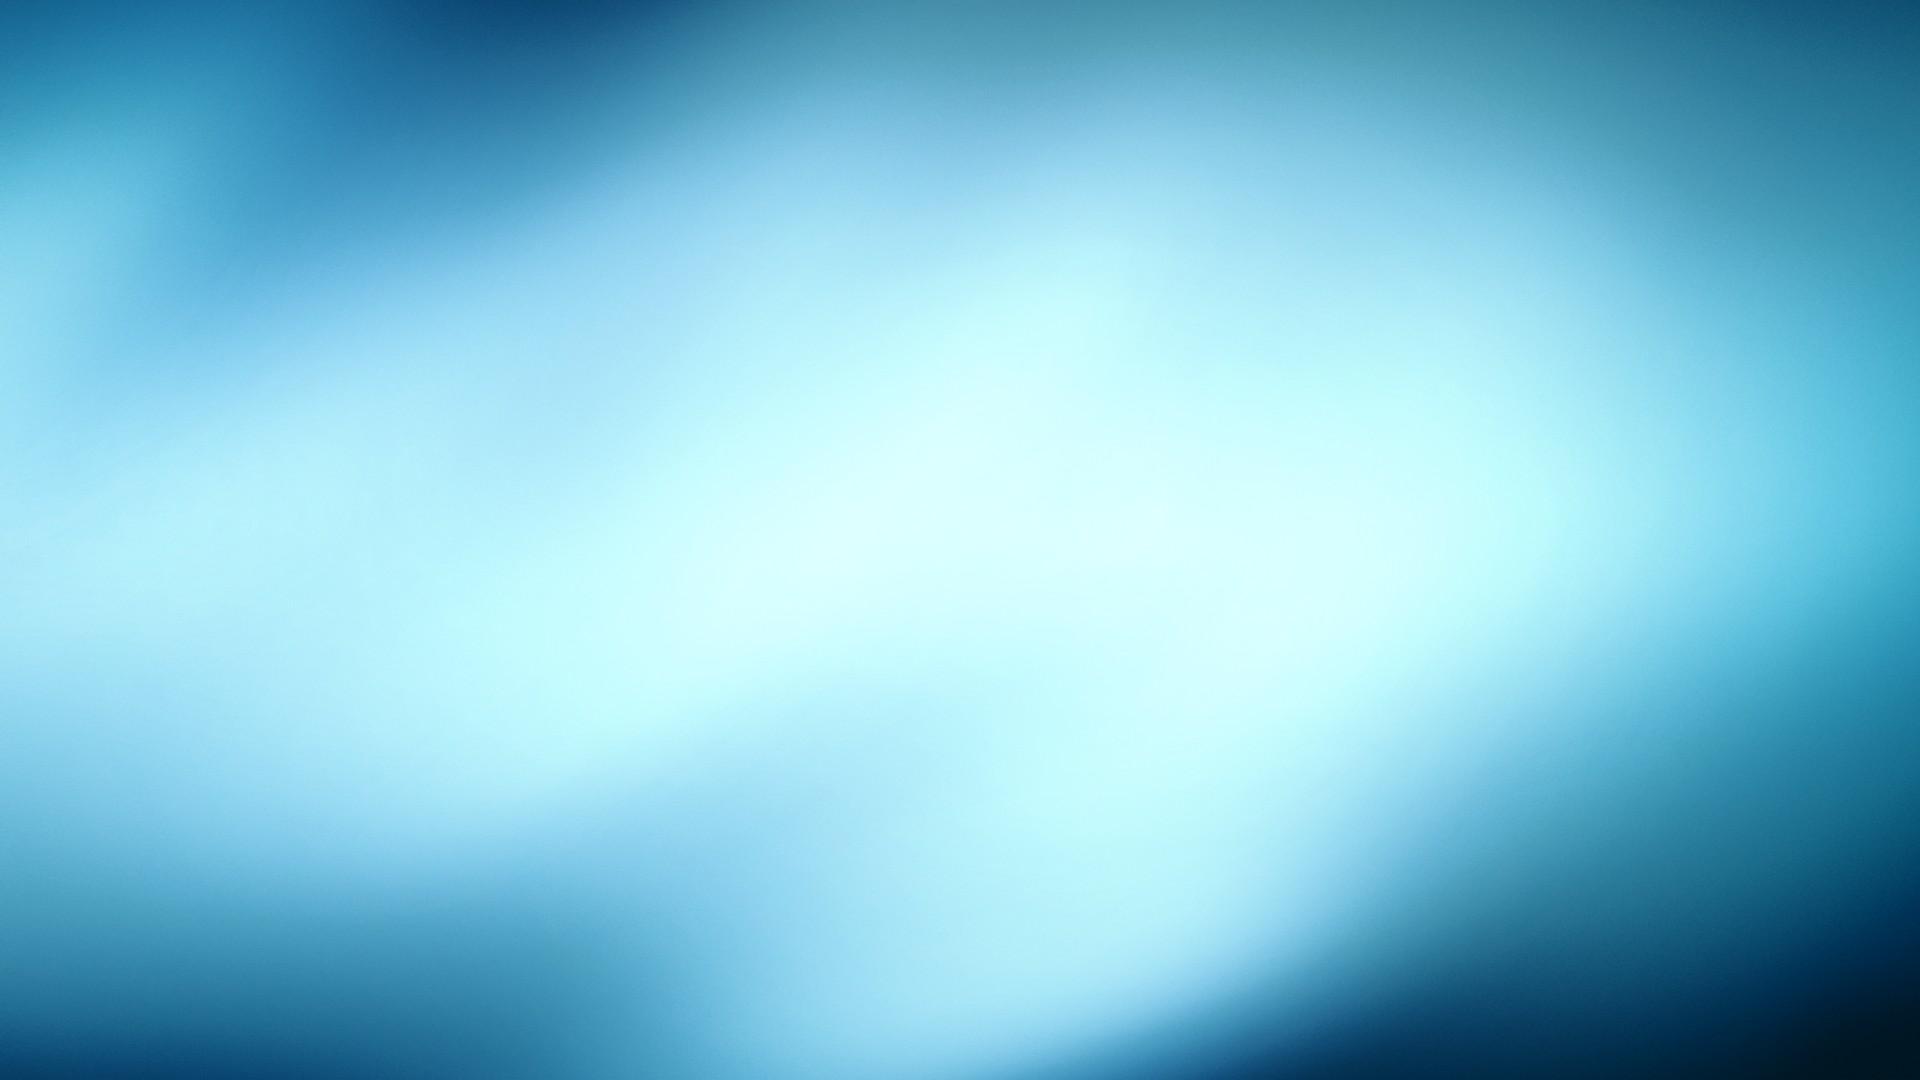 Free Hd Wallpapers Absract Wallpapers Desktop Wallpapers: Blue Abstract Wallpaper ·① Download Free Awesome